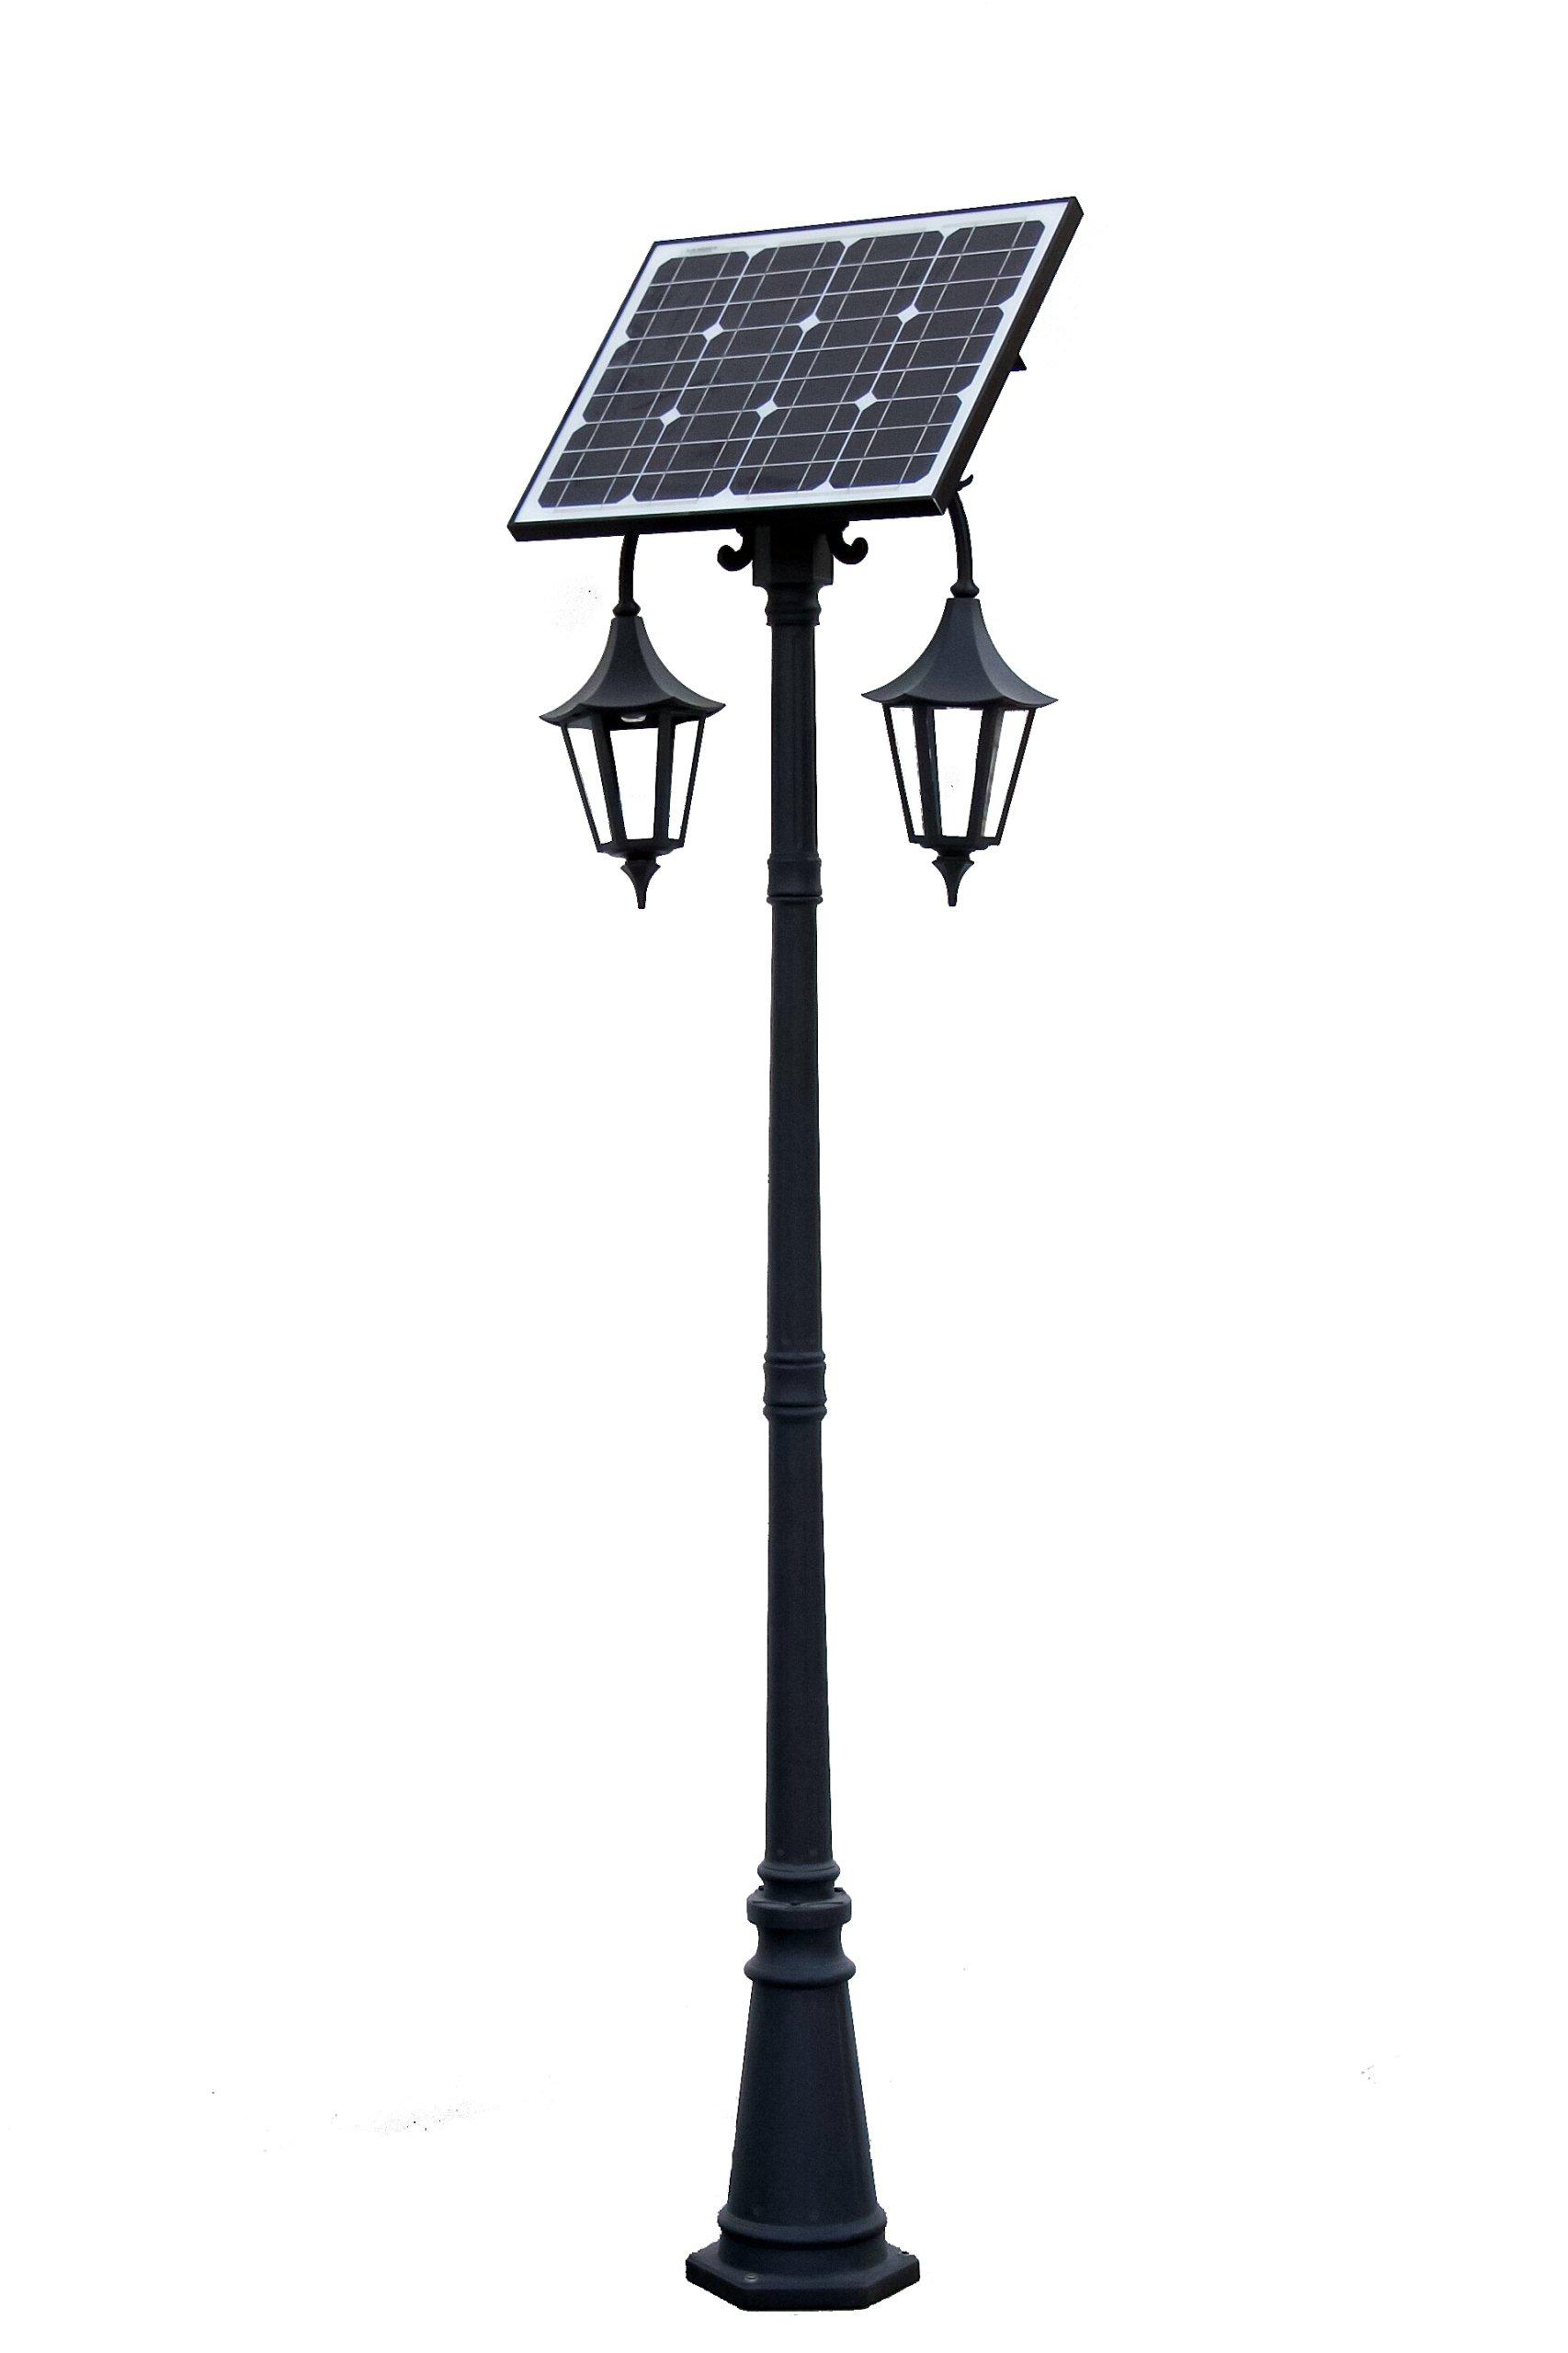 Lampy solárne svietidlo solárny Retro II 2.3 m